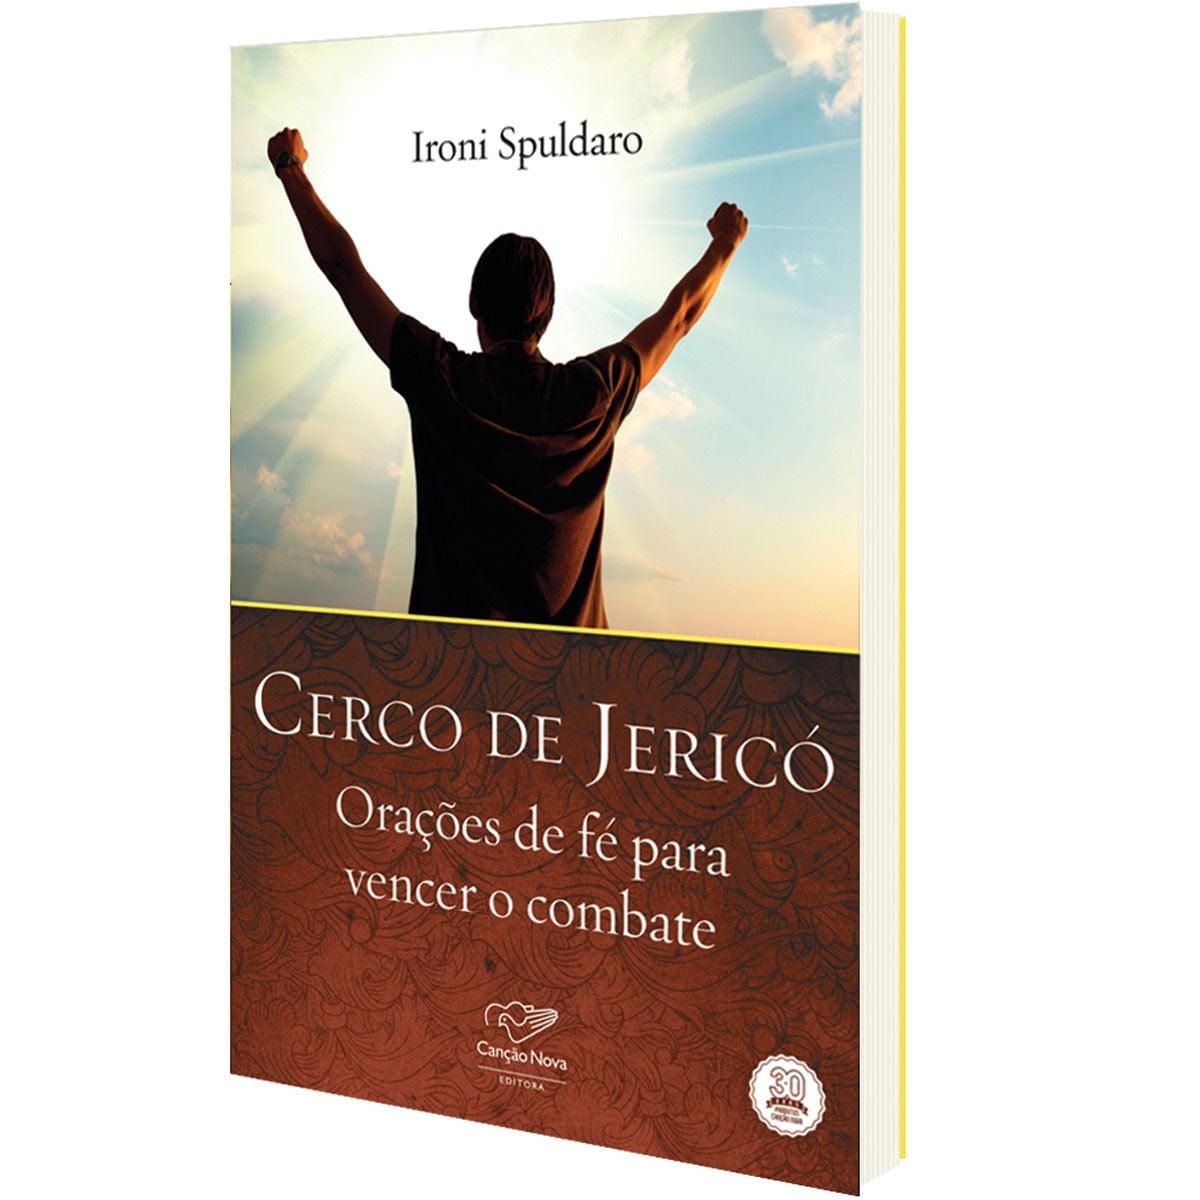 "IRONI SPULDARO - LIVRO ""CERCO DE JERICÓ"""